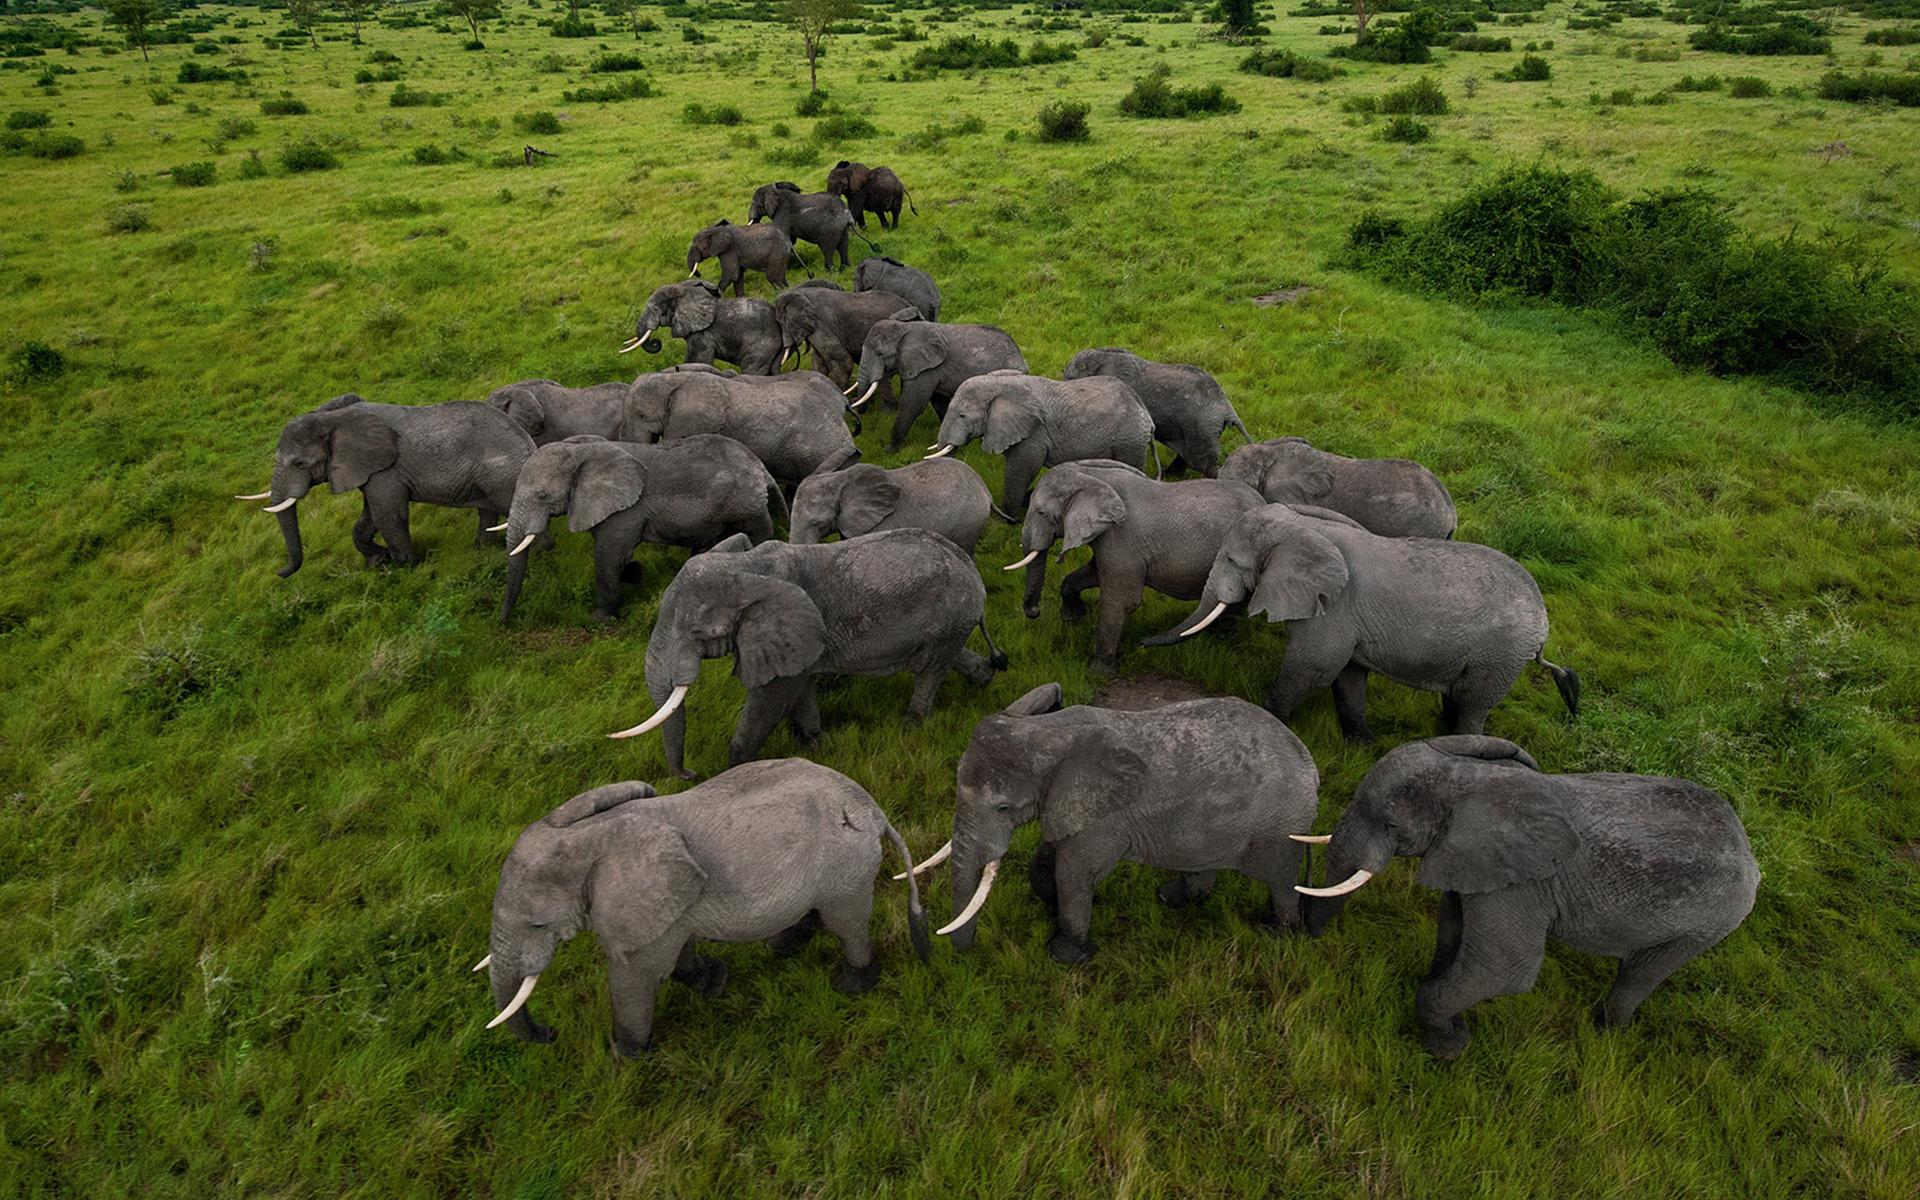 Elephants Herd Tree Mount Kilimanjaro, Kenya Beautiful Wallpaper ...